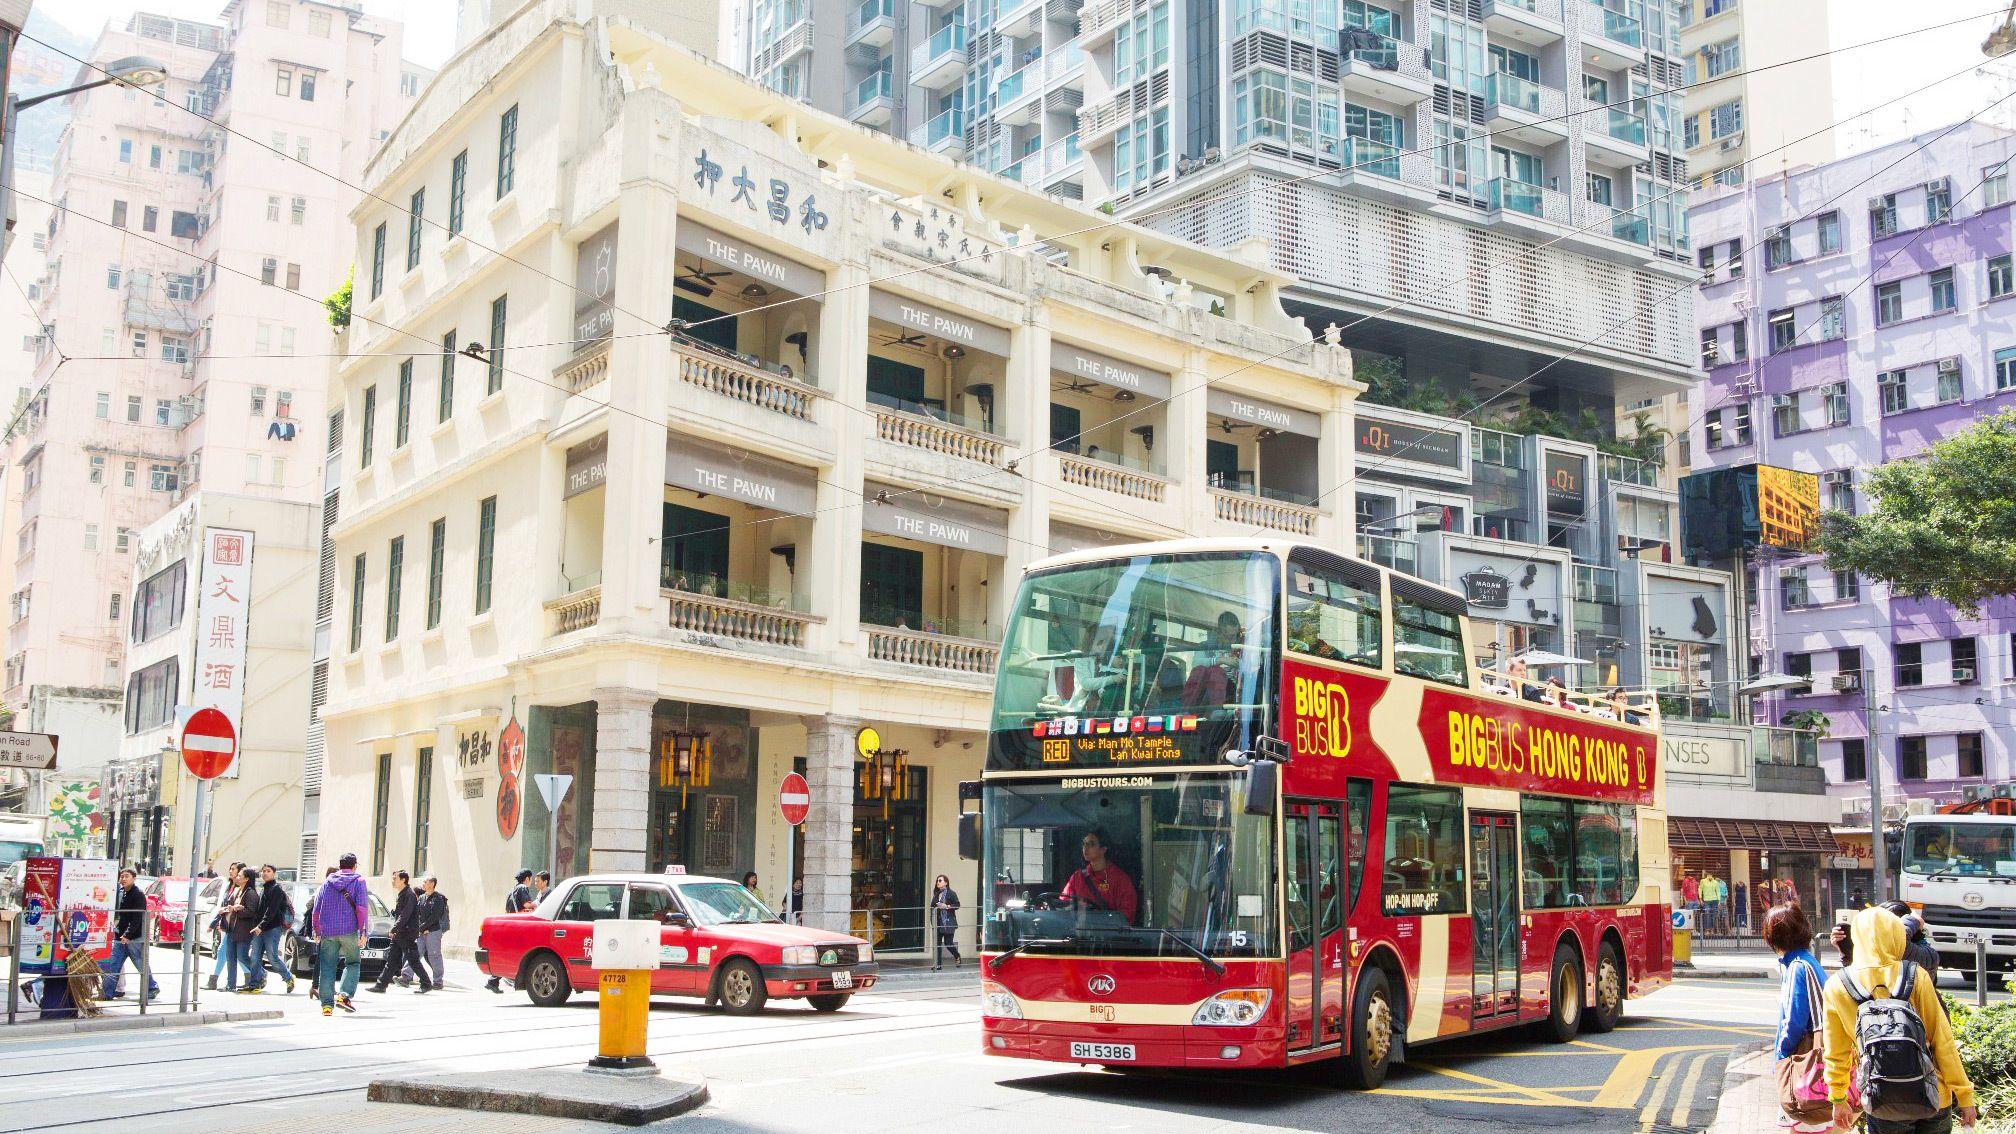 Navigating through the busy city in Hong Kong